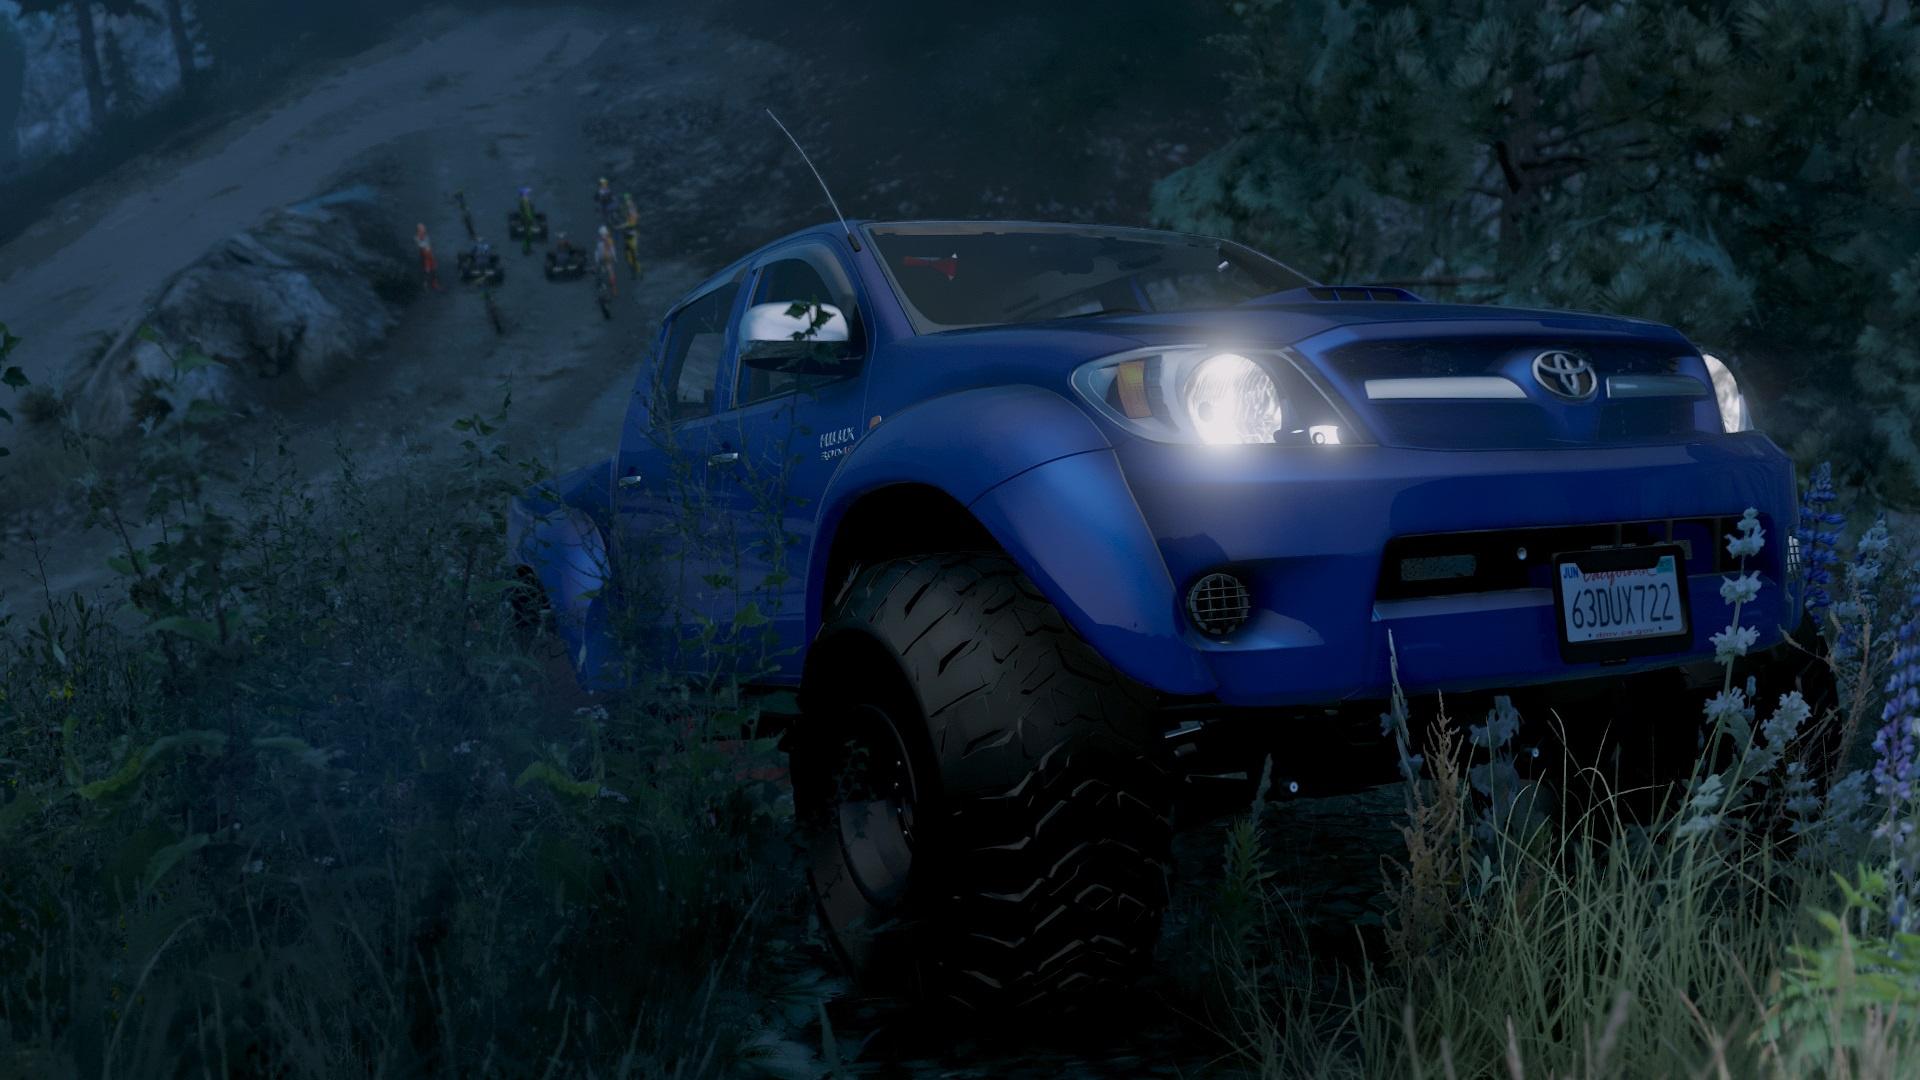 2007 Top Gear Toyota Hilux At38 Arctic Trucks Add On